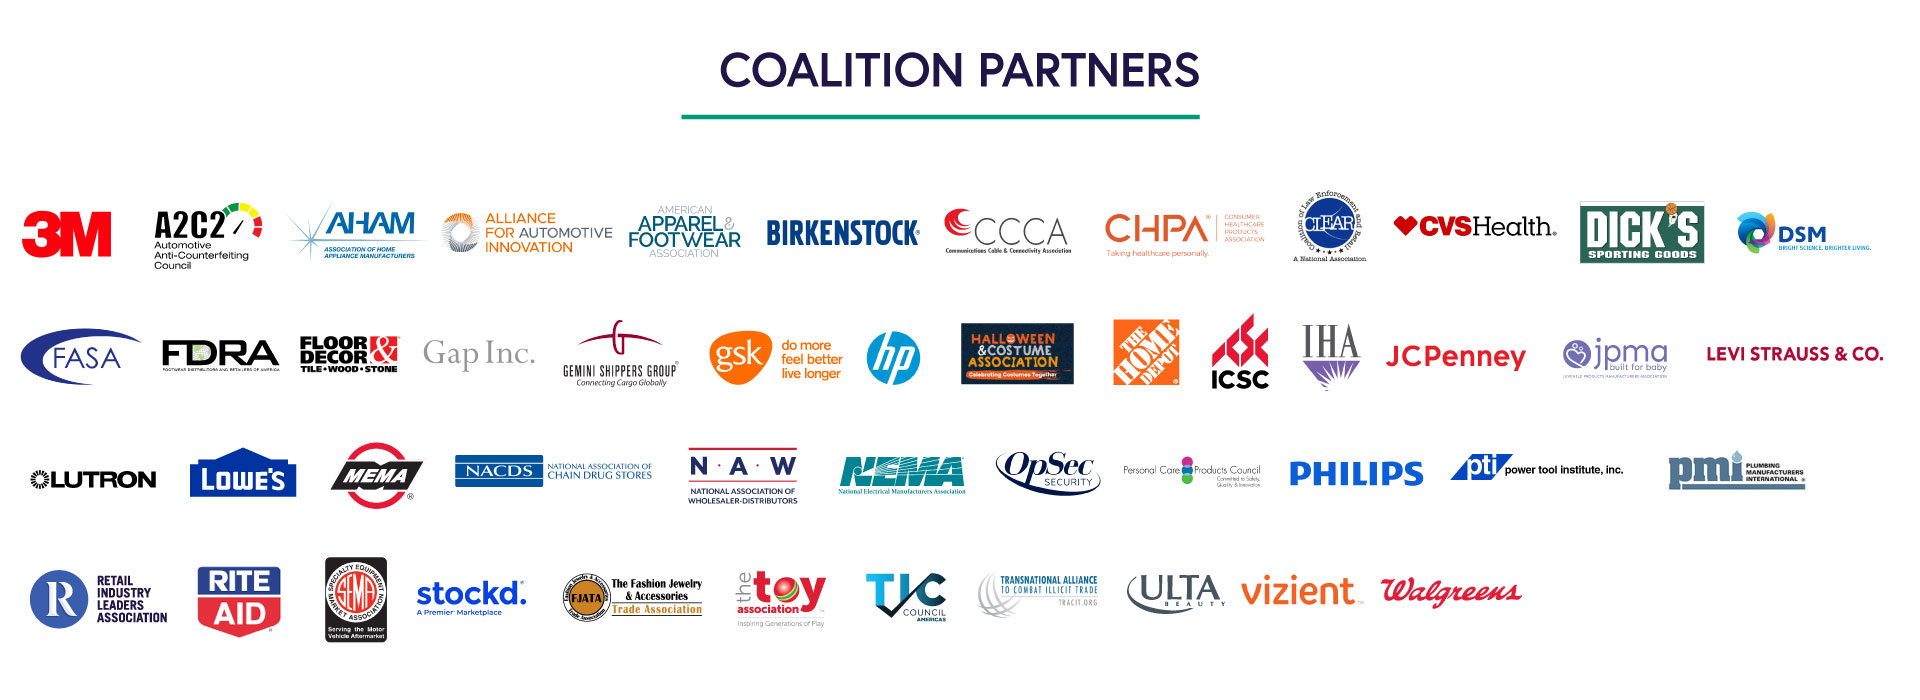 Buy Safe America Coalition Partners